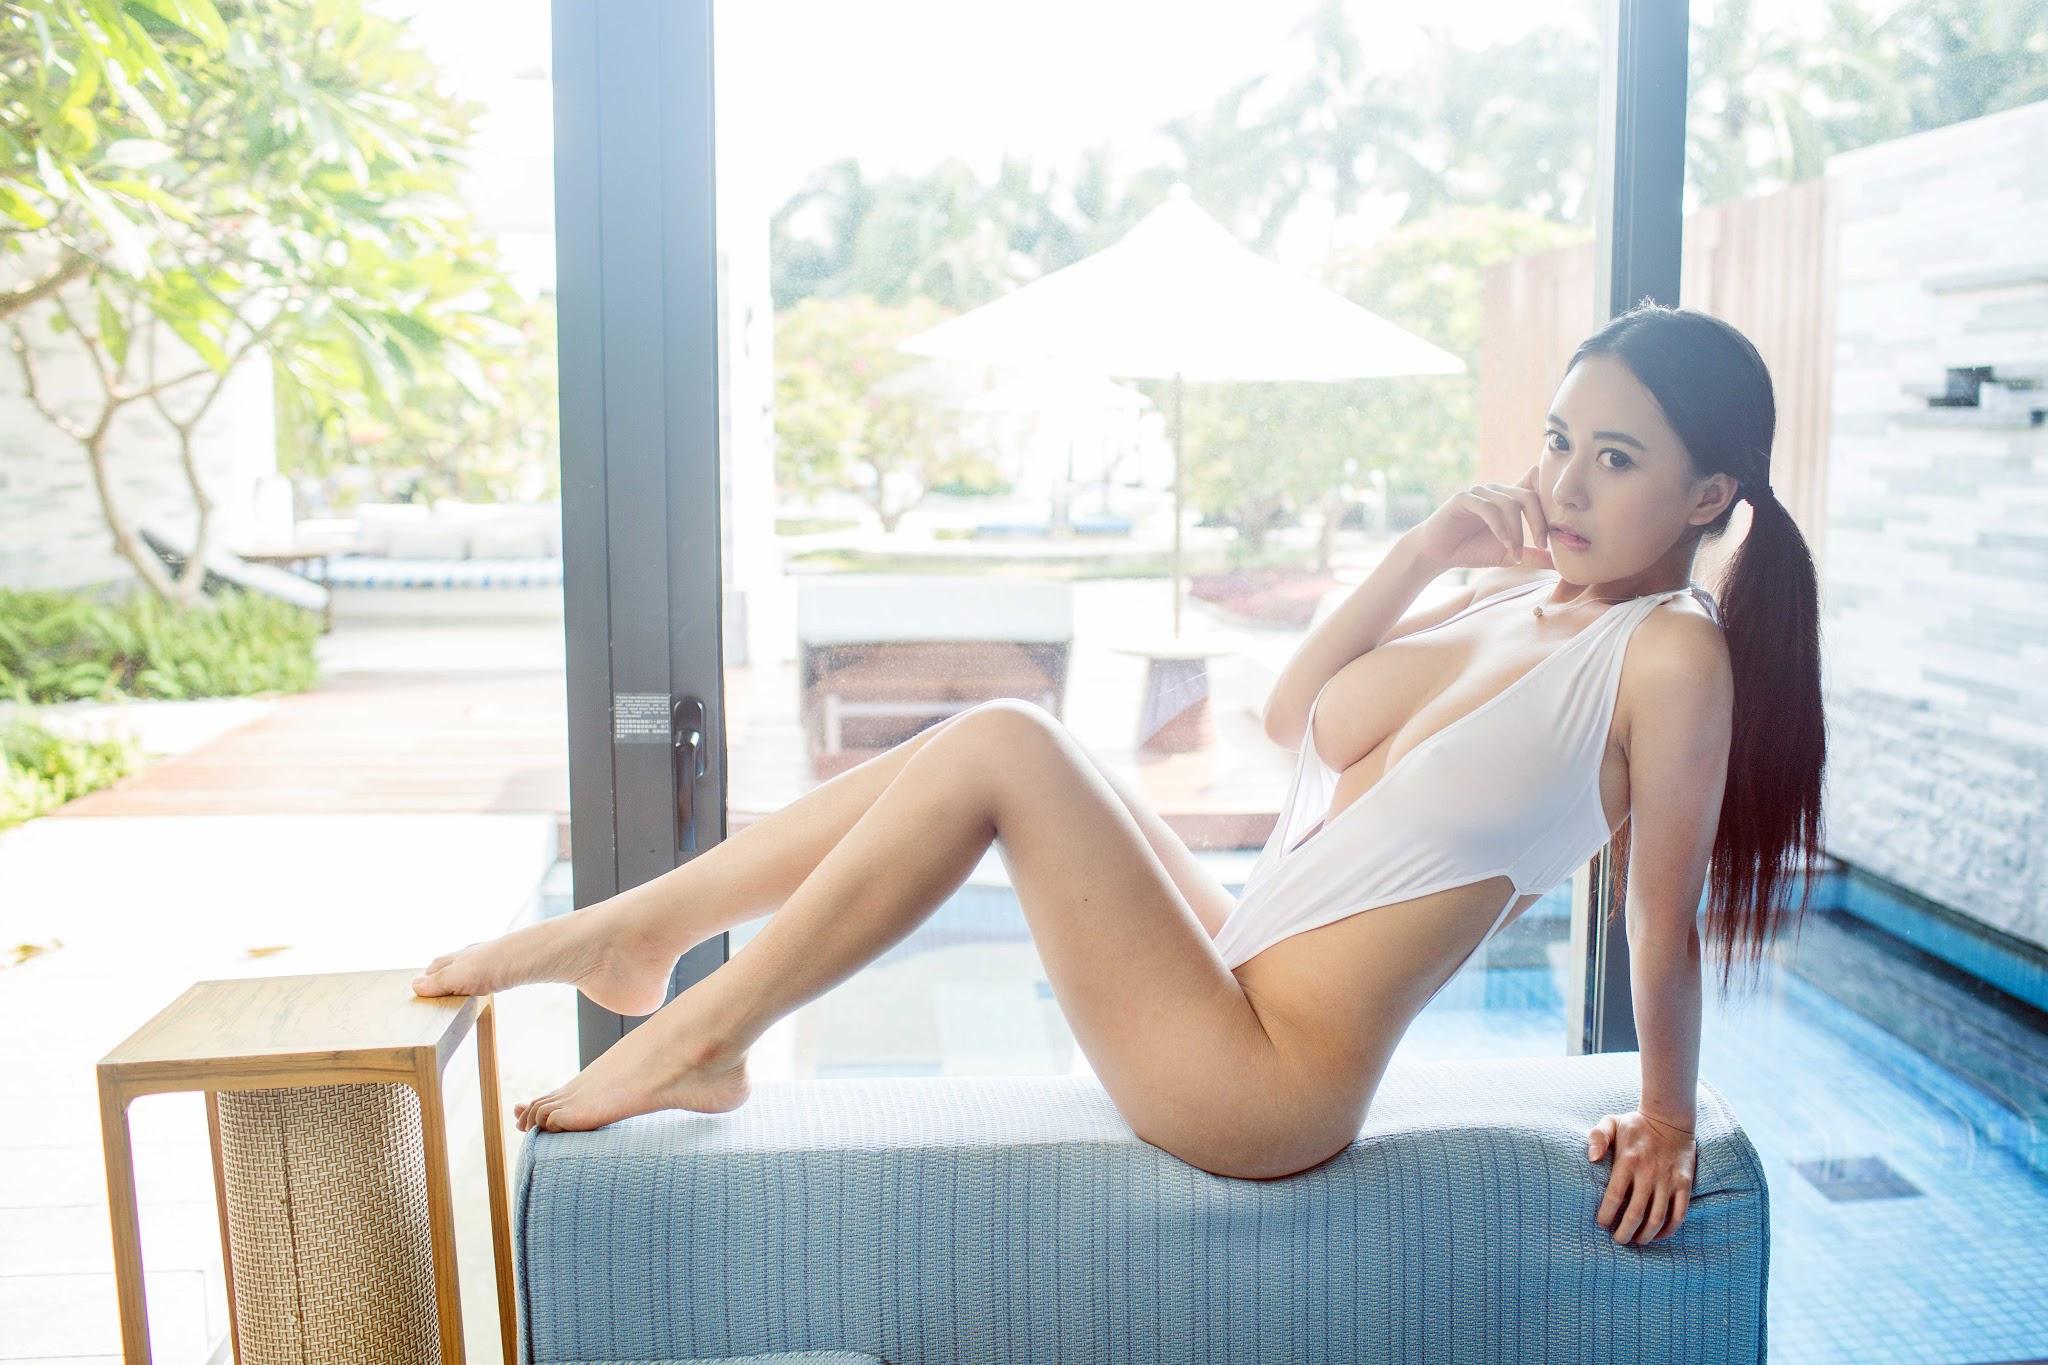 Small tit Huang Ke hot porn photos Girl. like